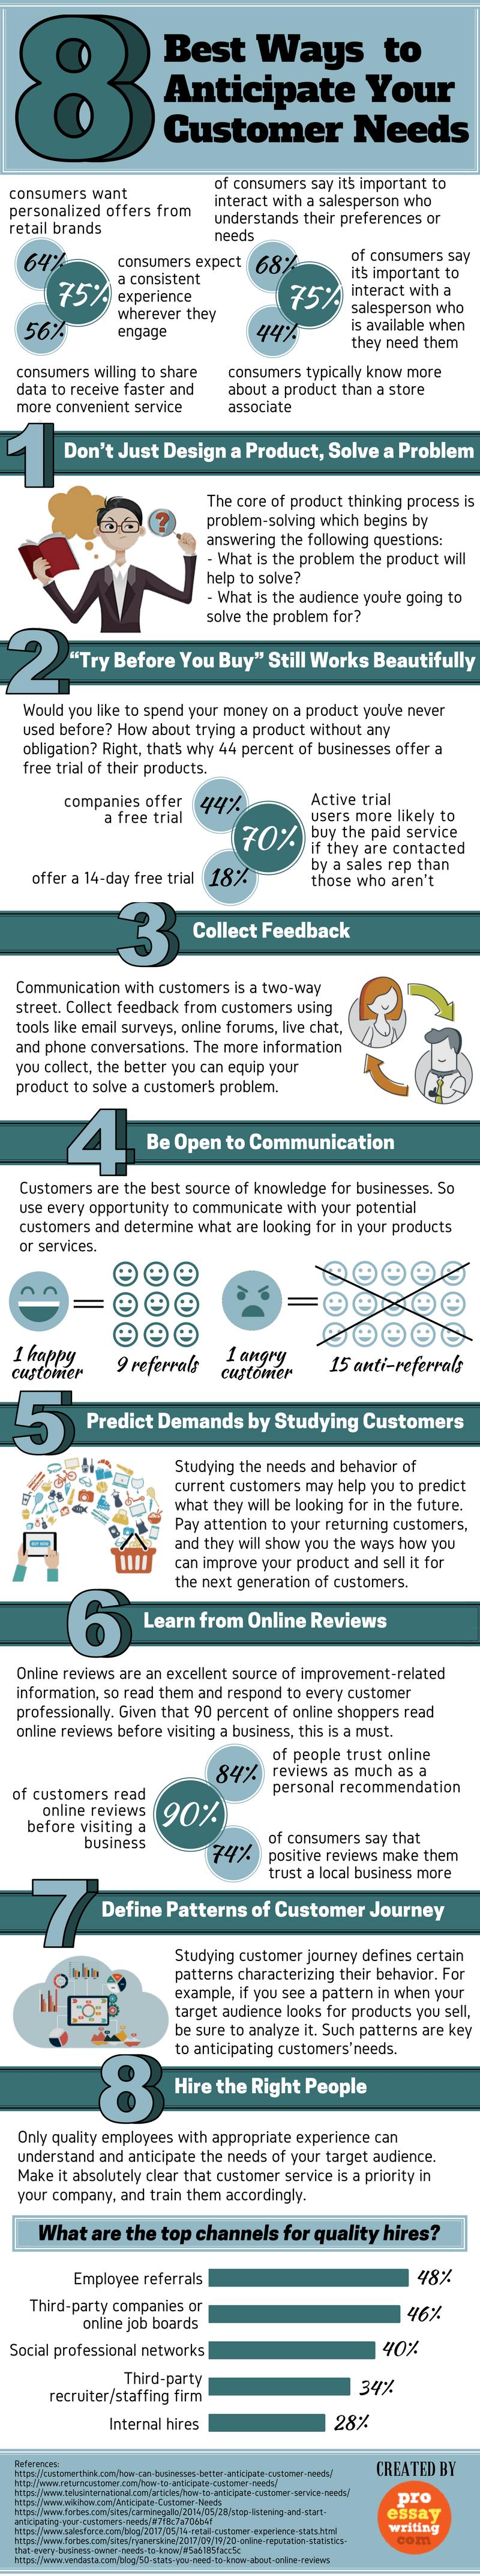 anticipate customer needs